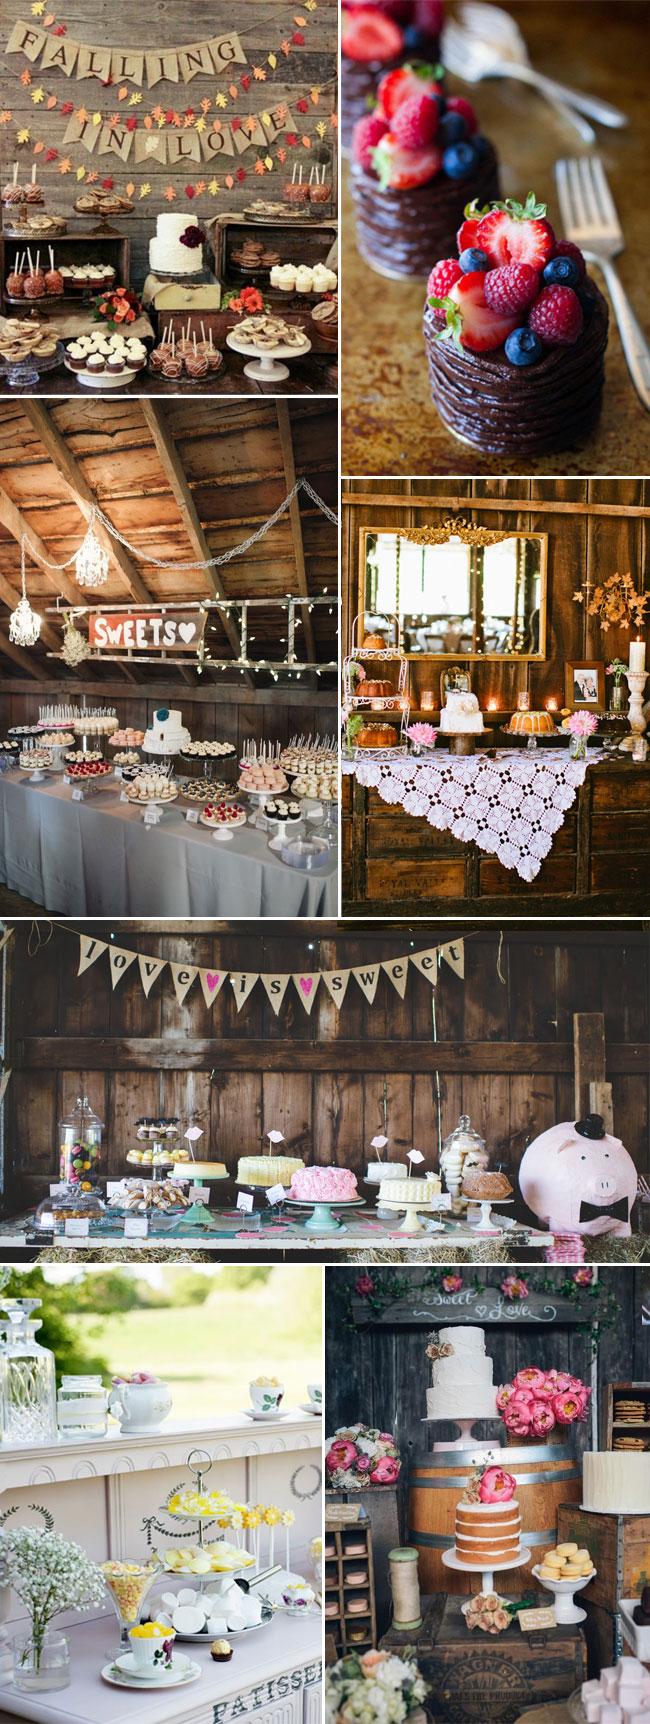 50 Rustic Fall Barn Wedding Ideas That Will Take Your